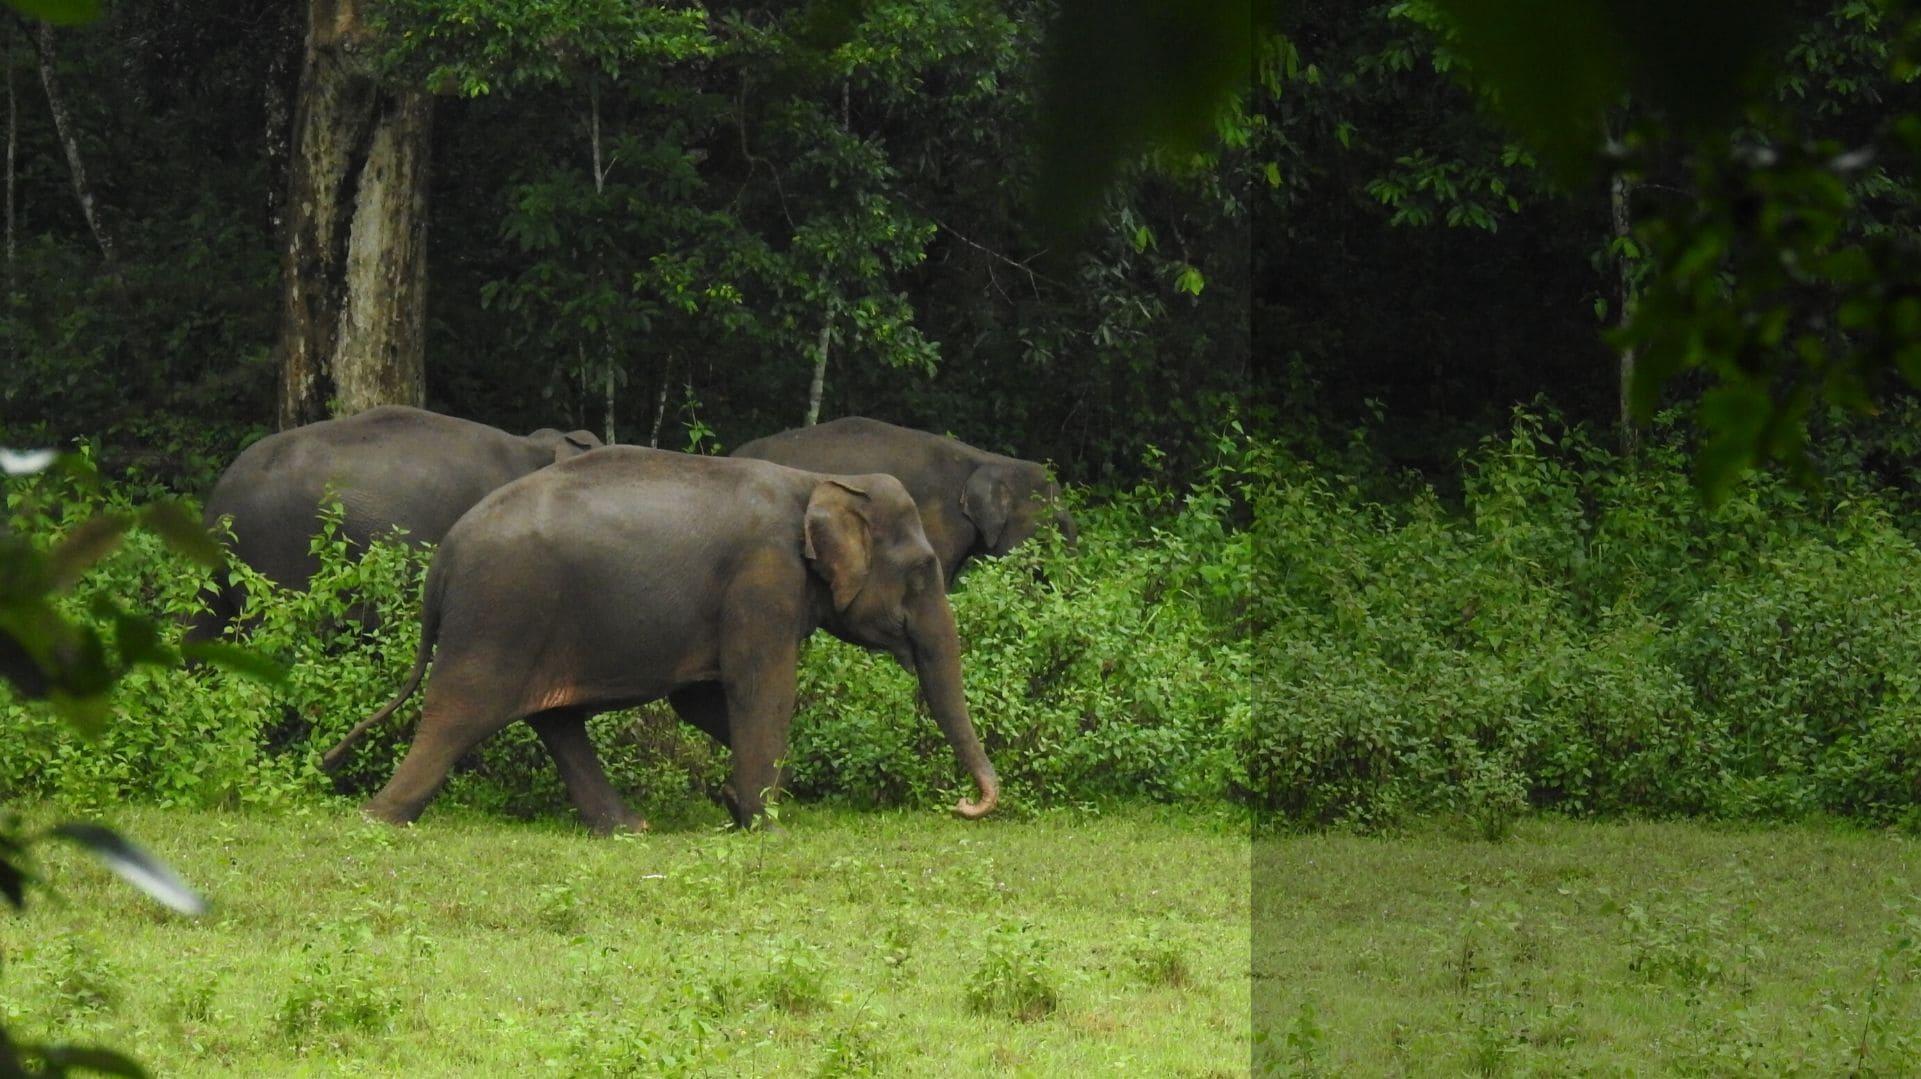 Can a new elephant reserve address human-elephant interaction in Chhattisgarh?